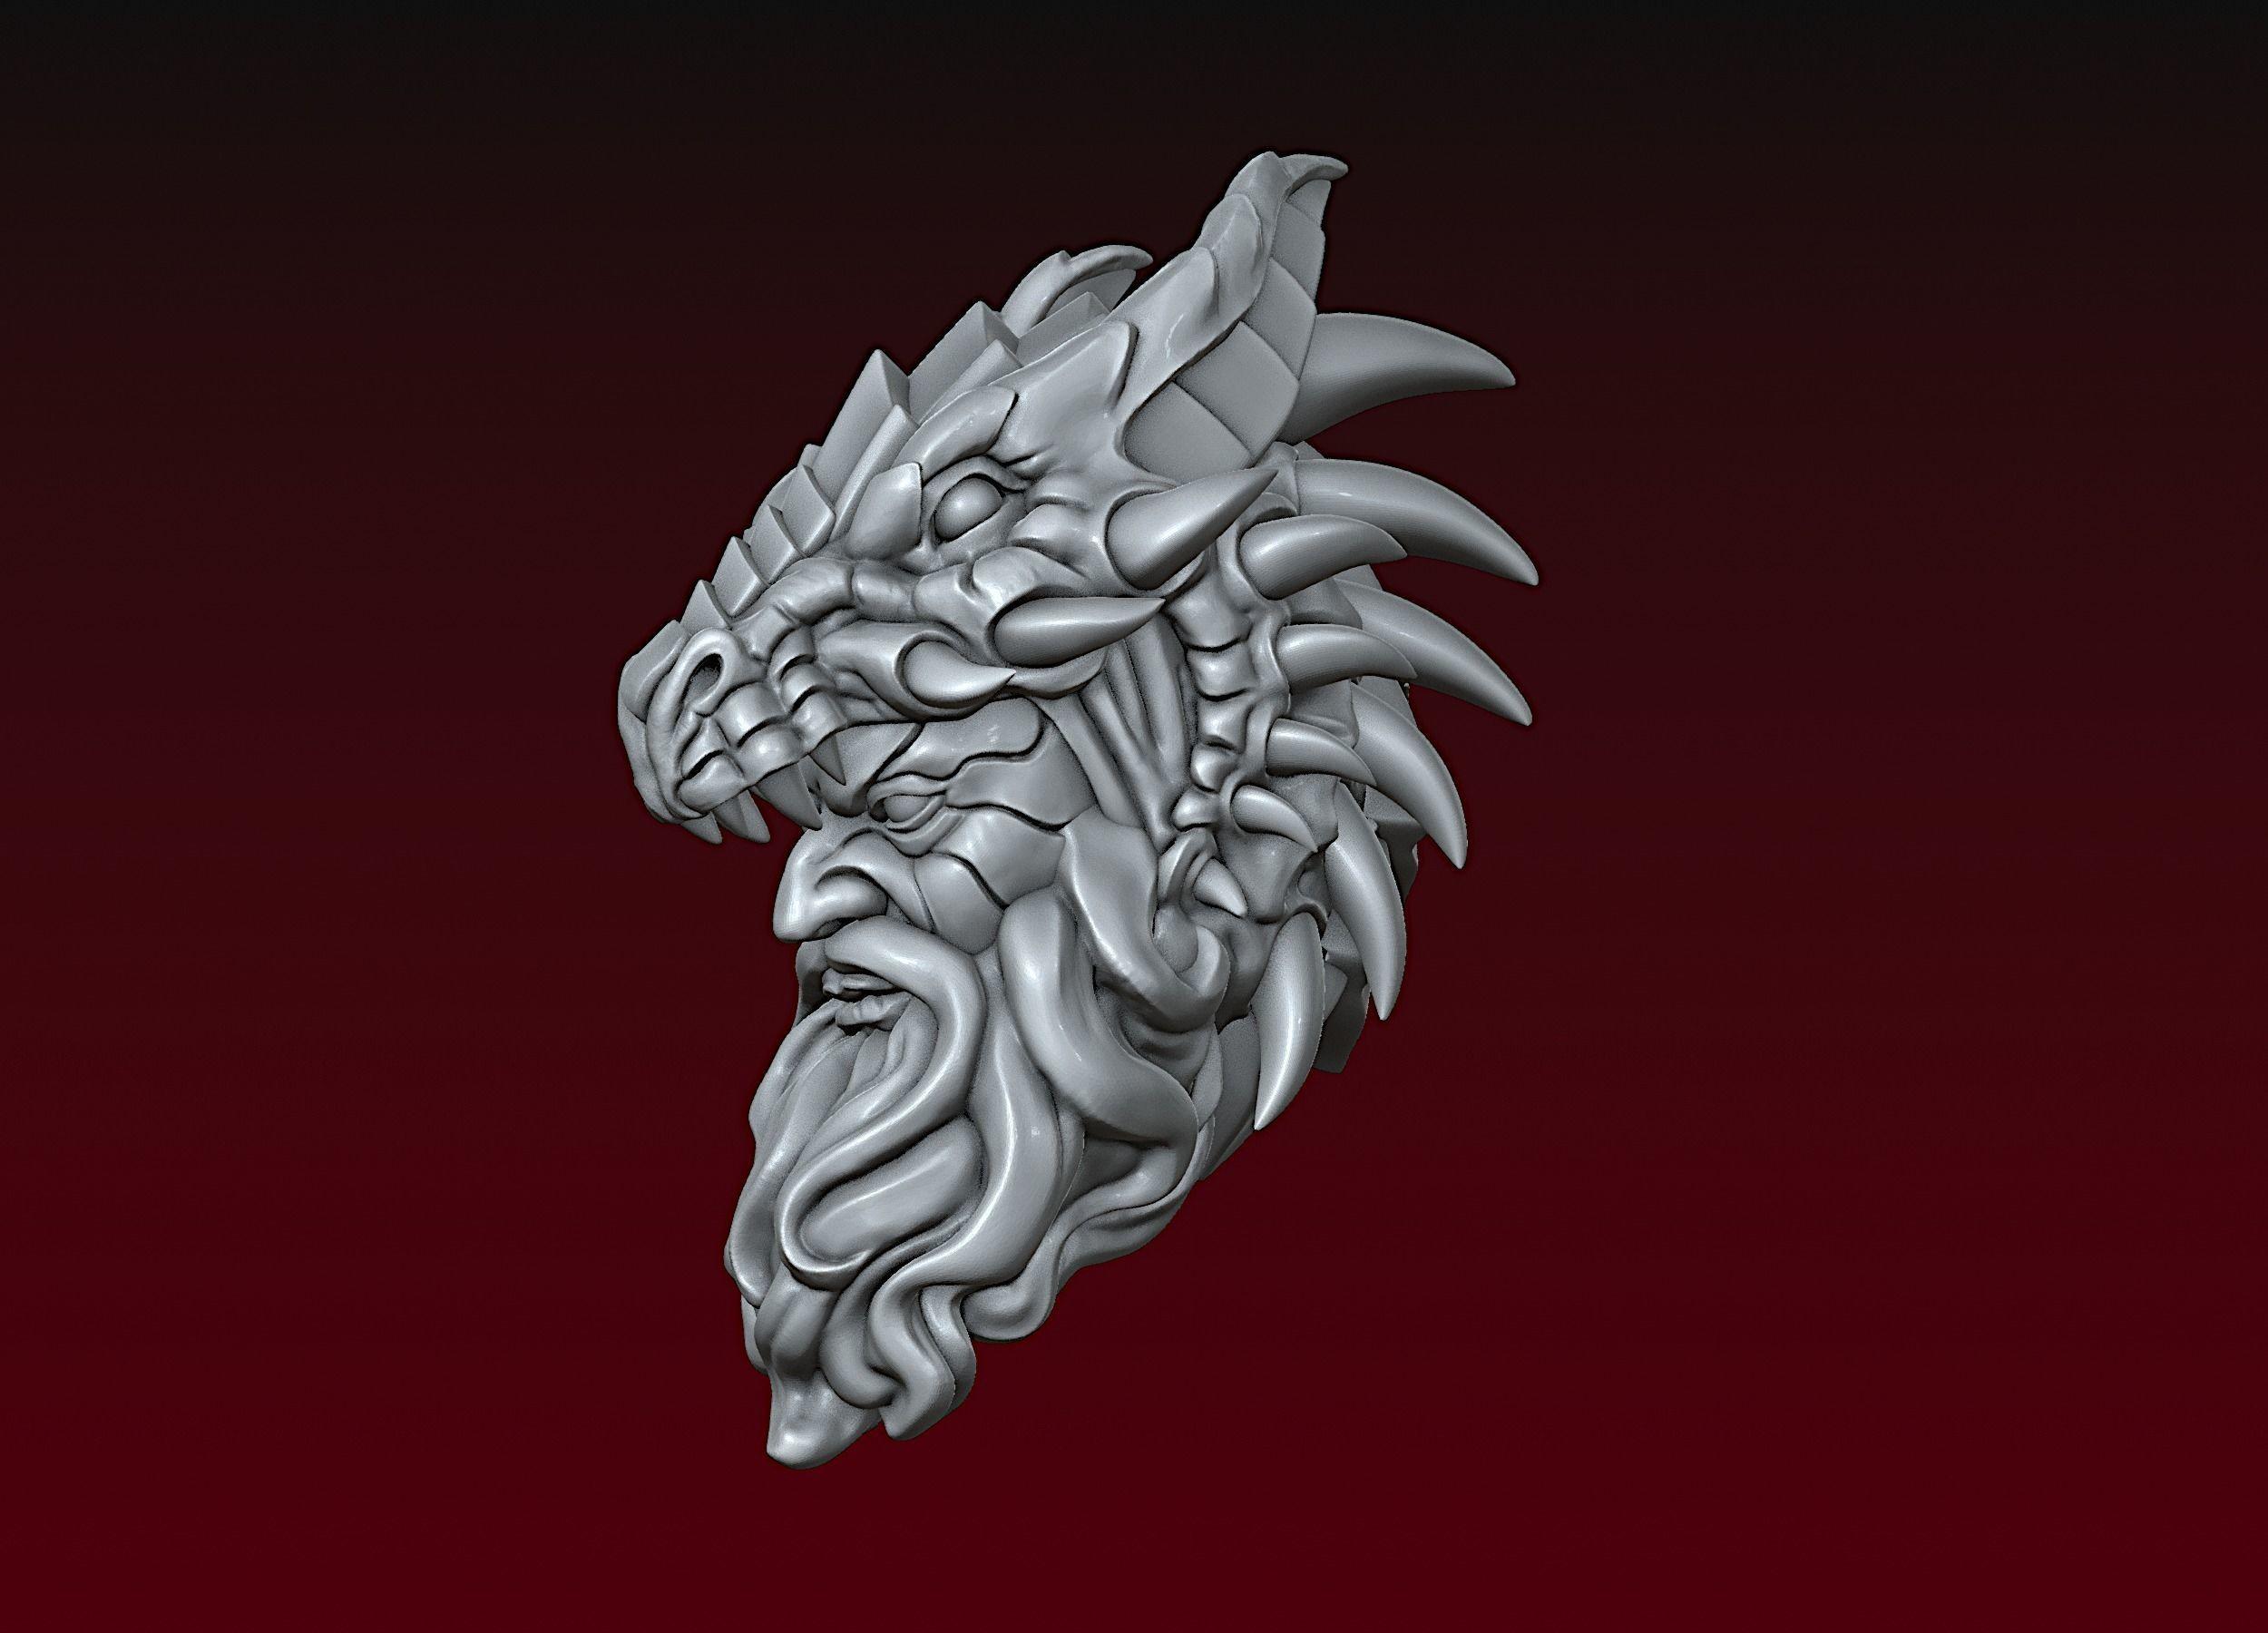 Dragon spirit head